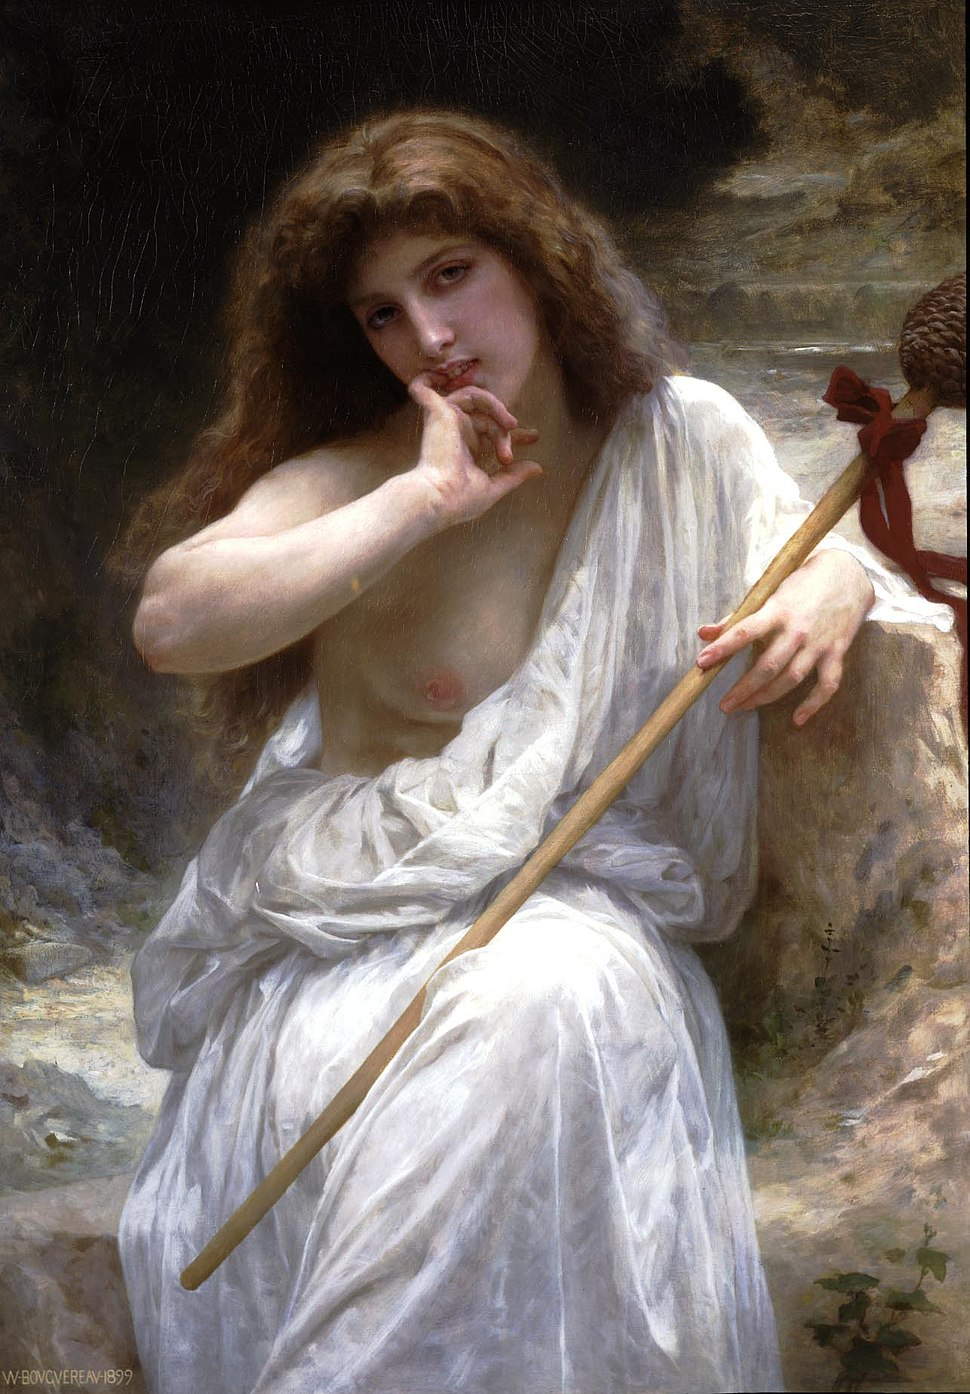 William-Adolphe Bouguereau (1825-1905) - Mailice (1899)